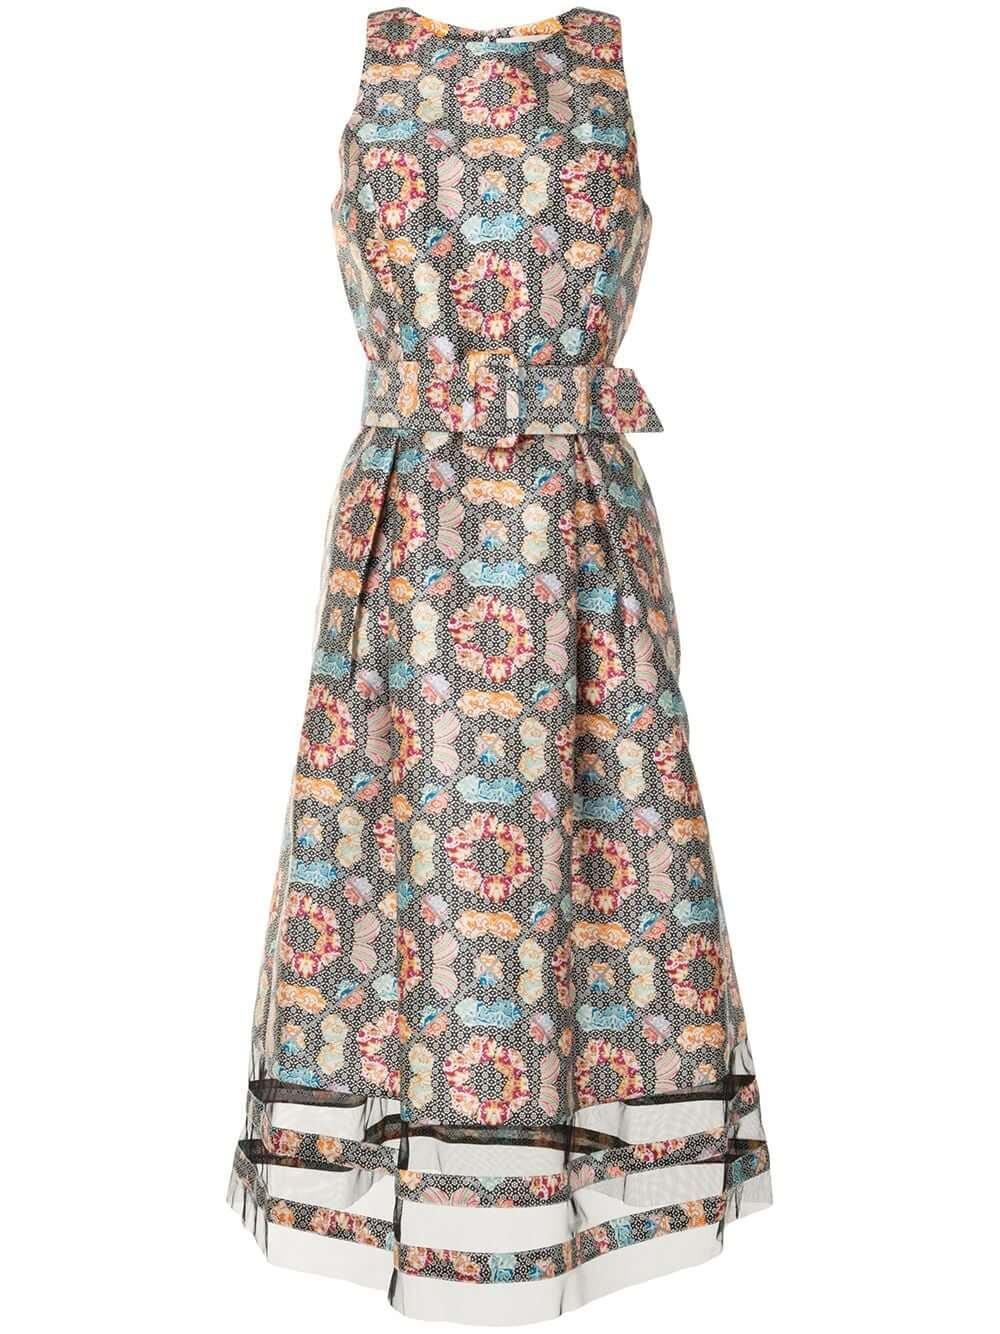 Rani Printed Dress